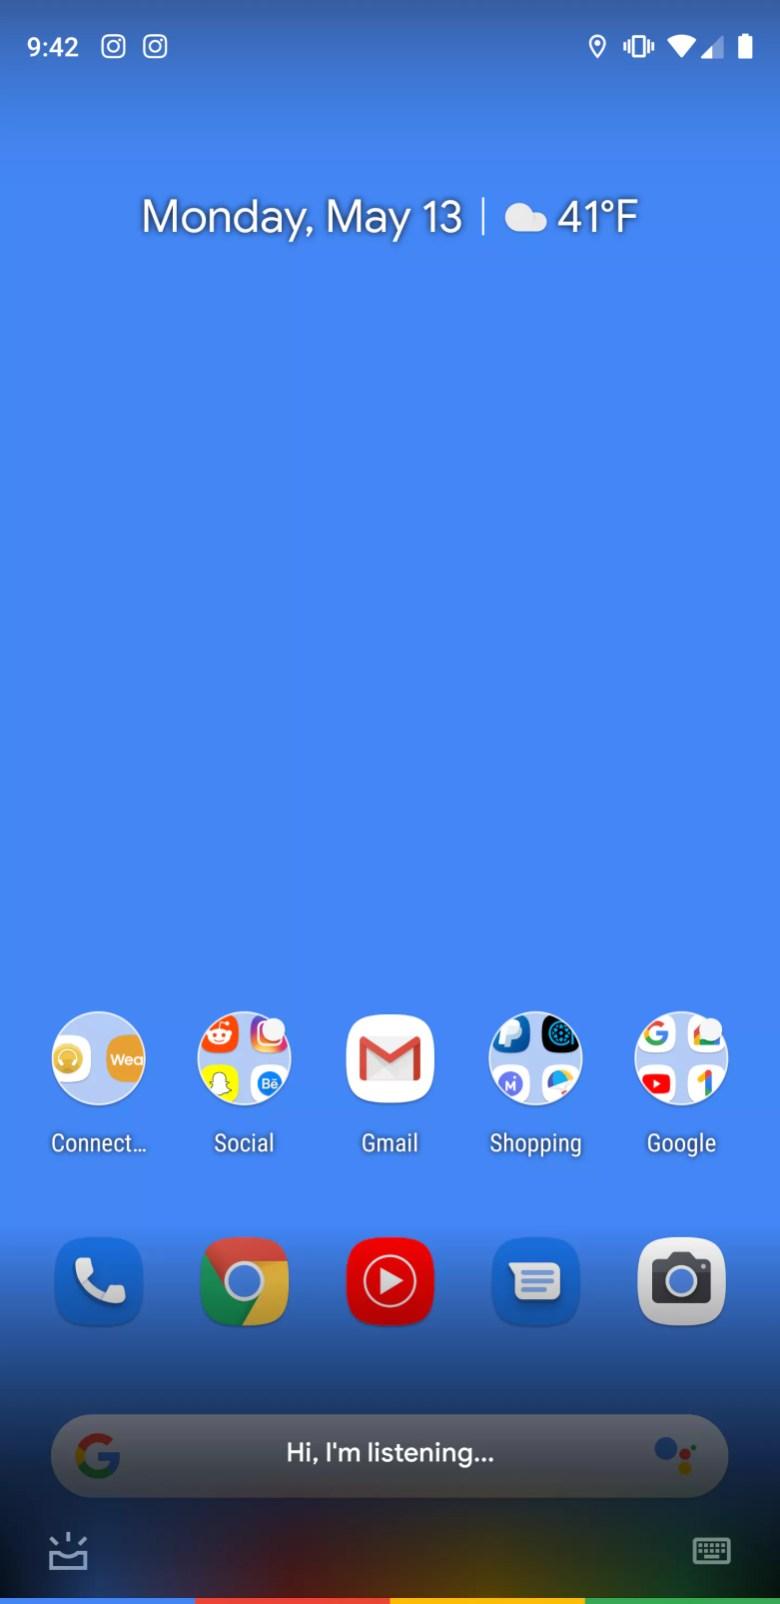 New Google Assistant design (1)